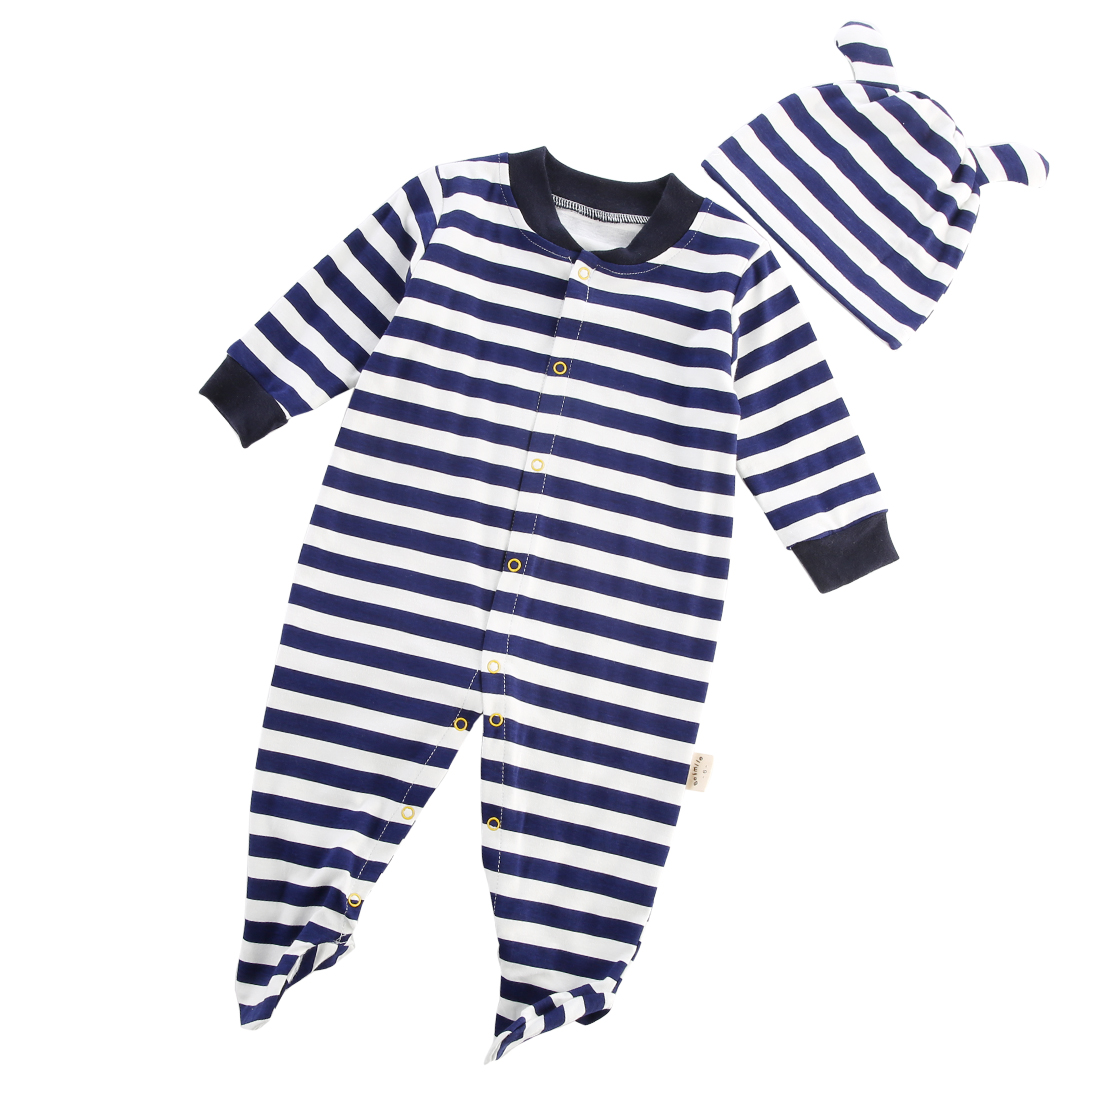 97c4088f2 Φ Φ2pc Newborn Girls Boys Infant Hoodie Jumpsuit Bodysuit Cotton ...